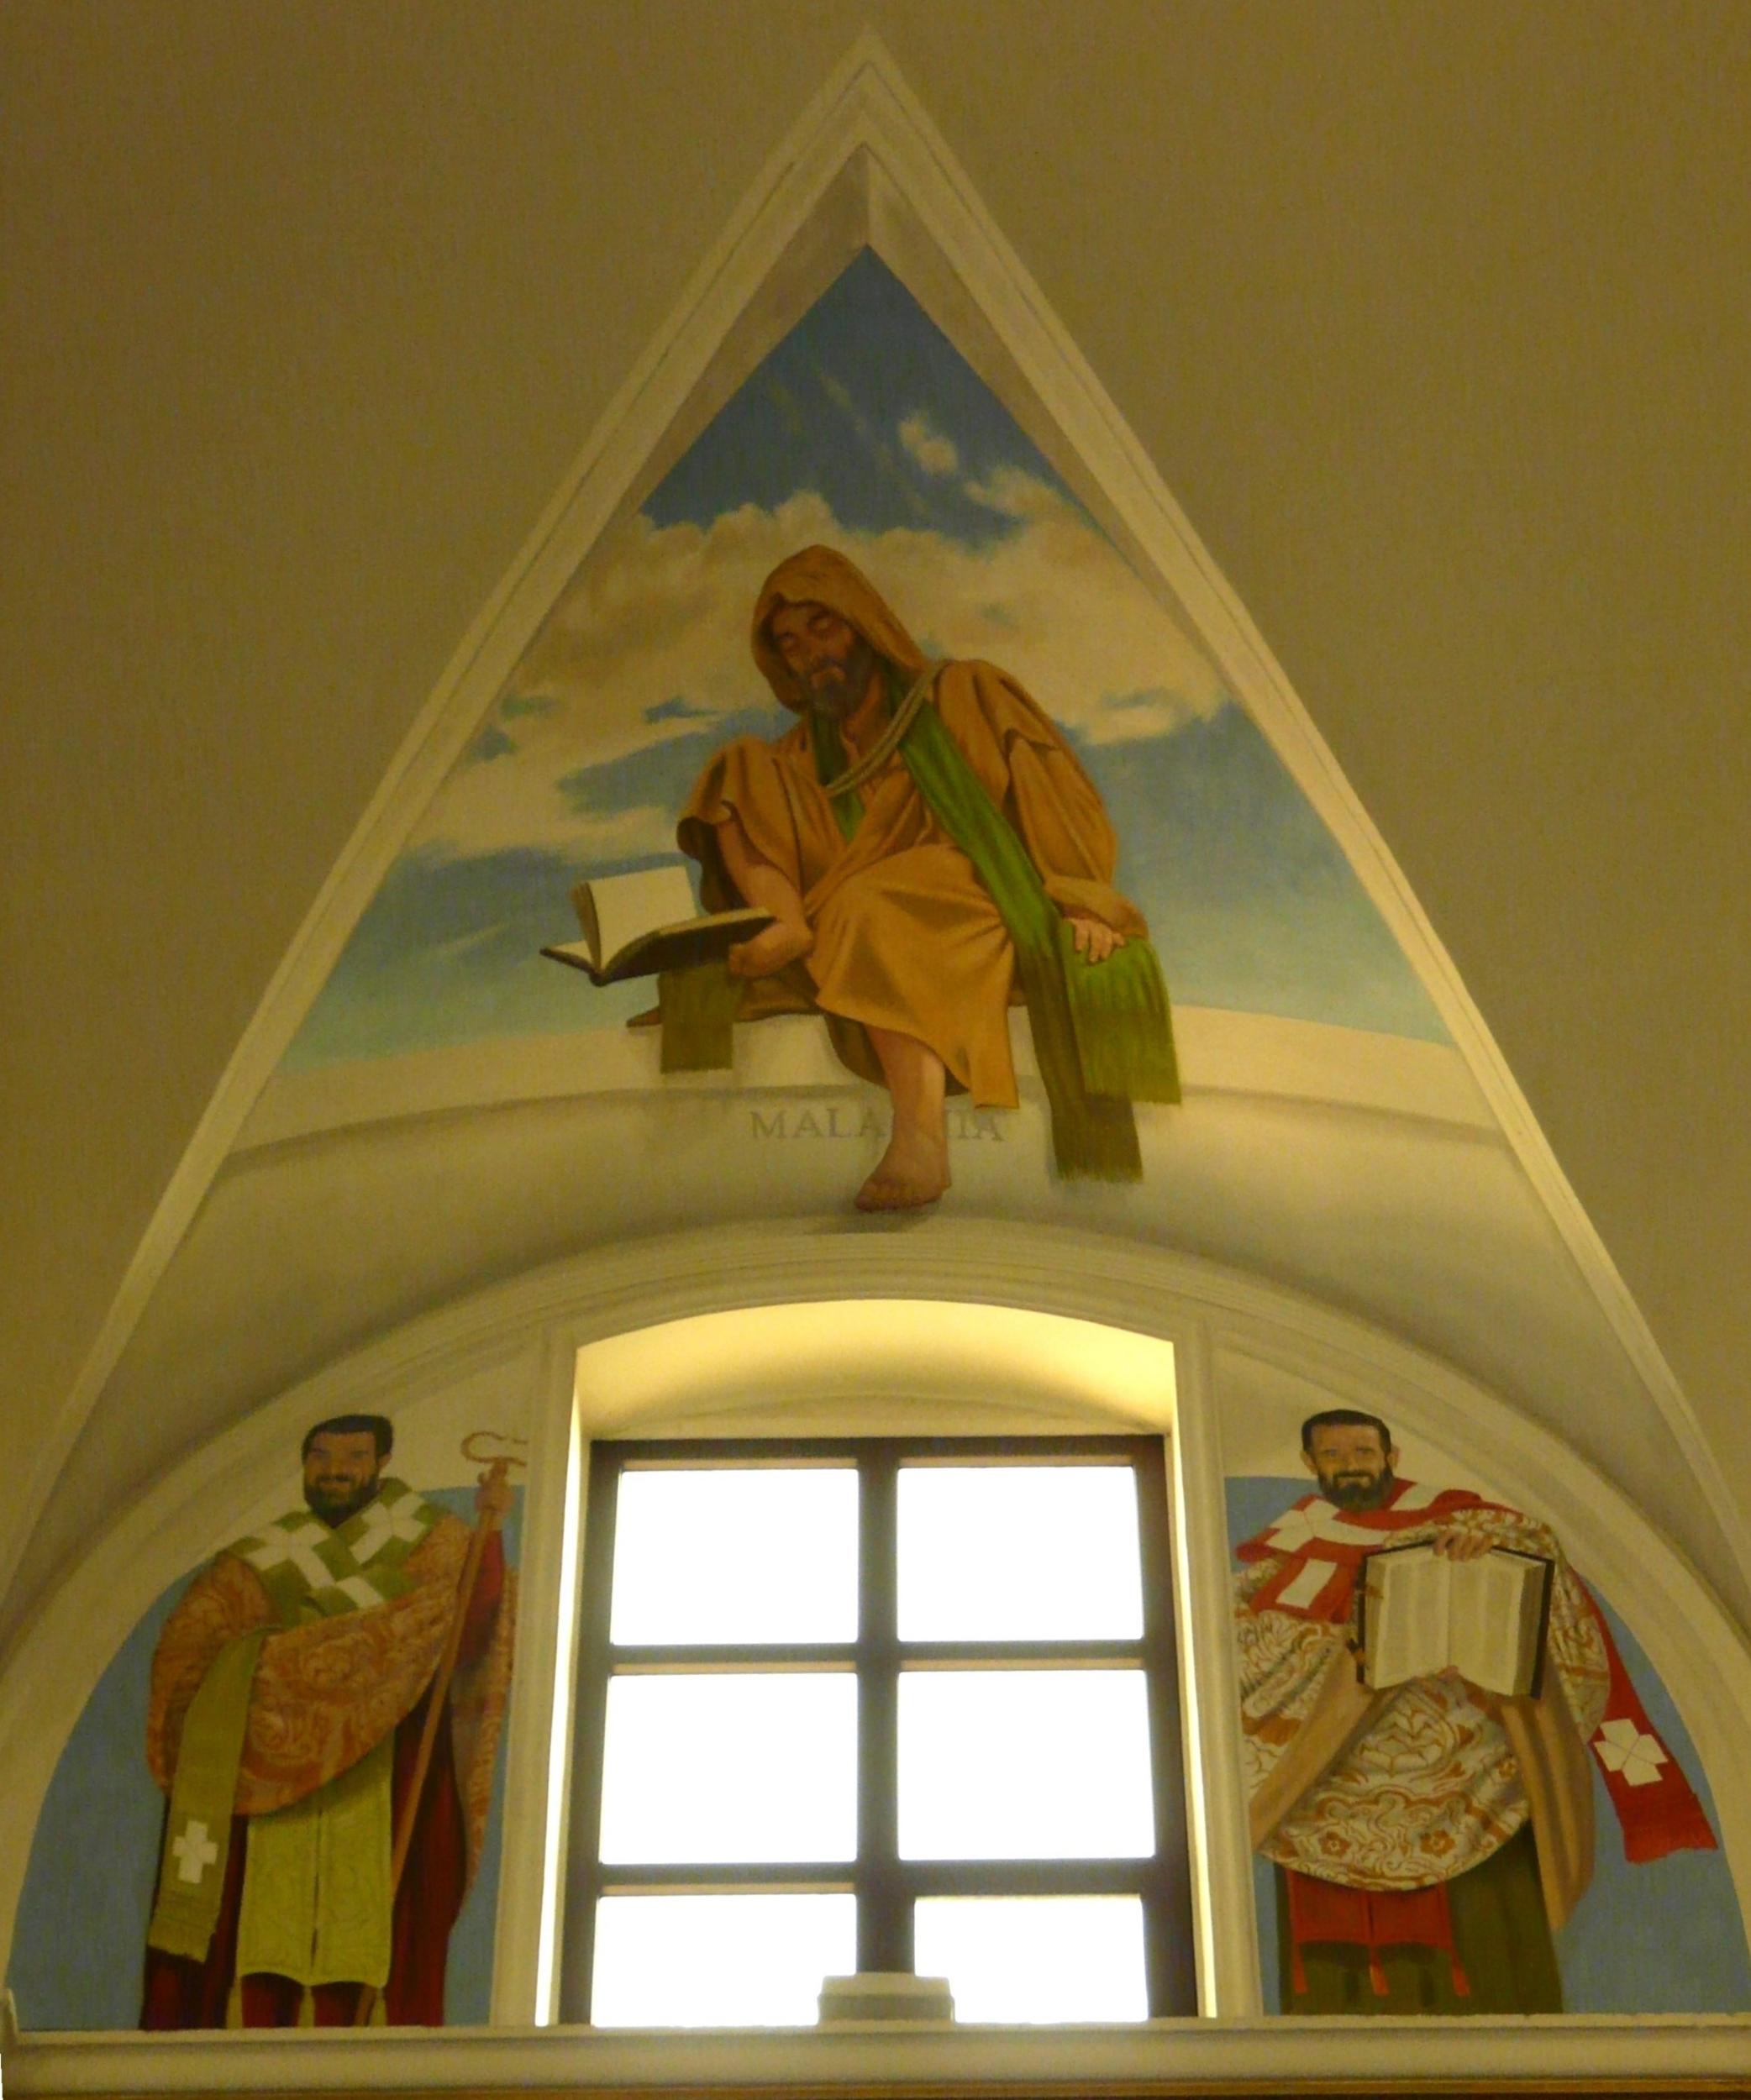 Rodolfo Papa, Cattedrale di Bojano 9.jpg